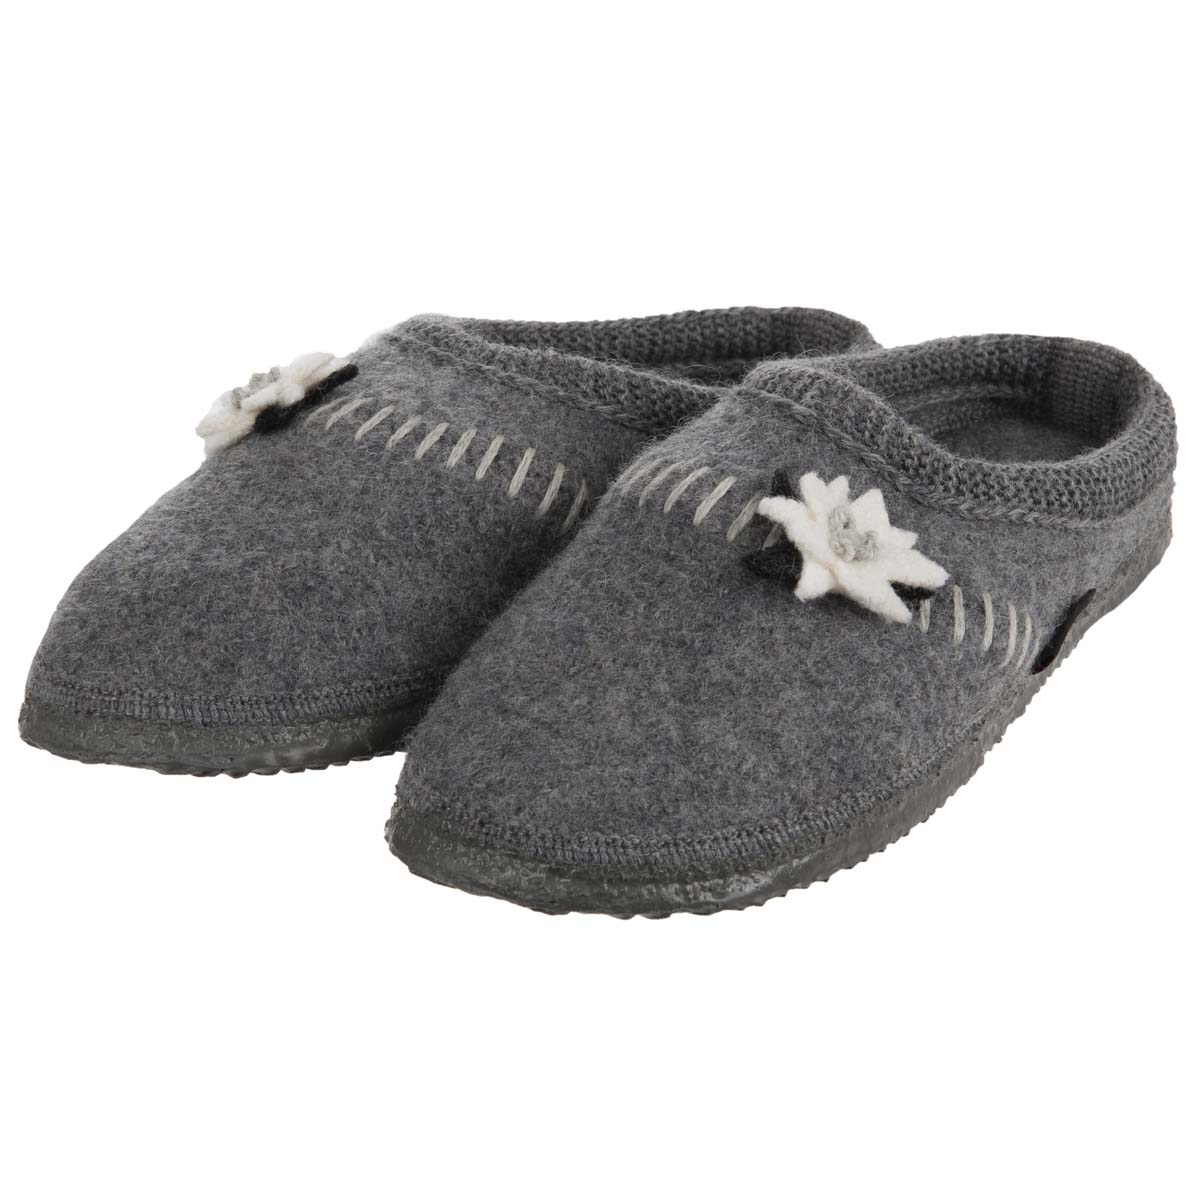 Modello Neumark Firmate Pantofole Donna Giesswein QxBtshrdCo